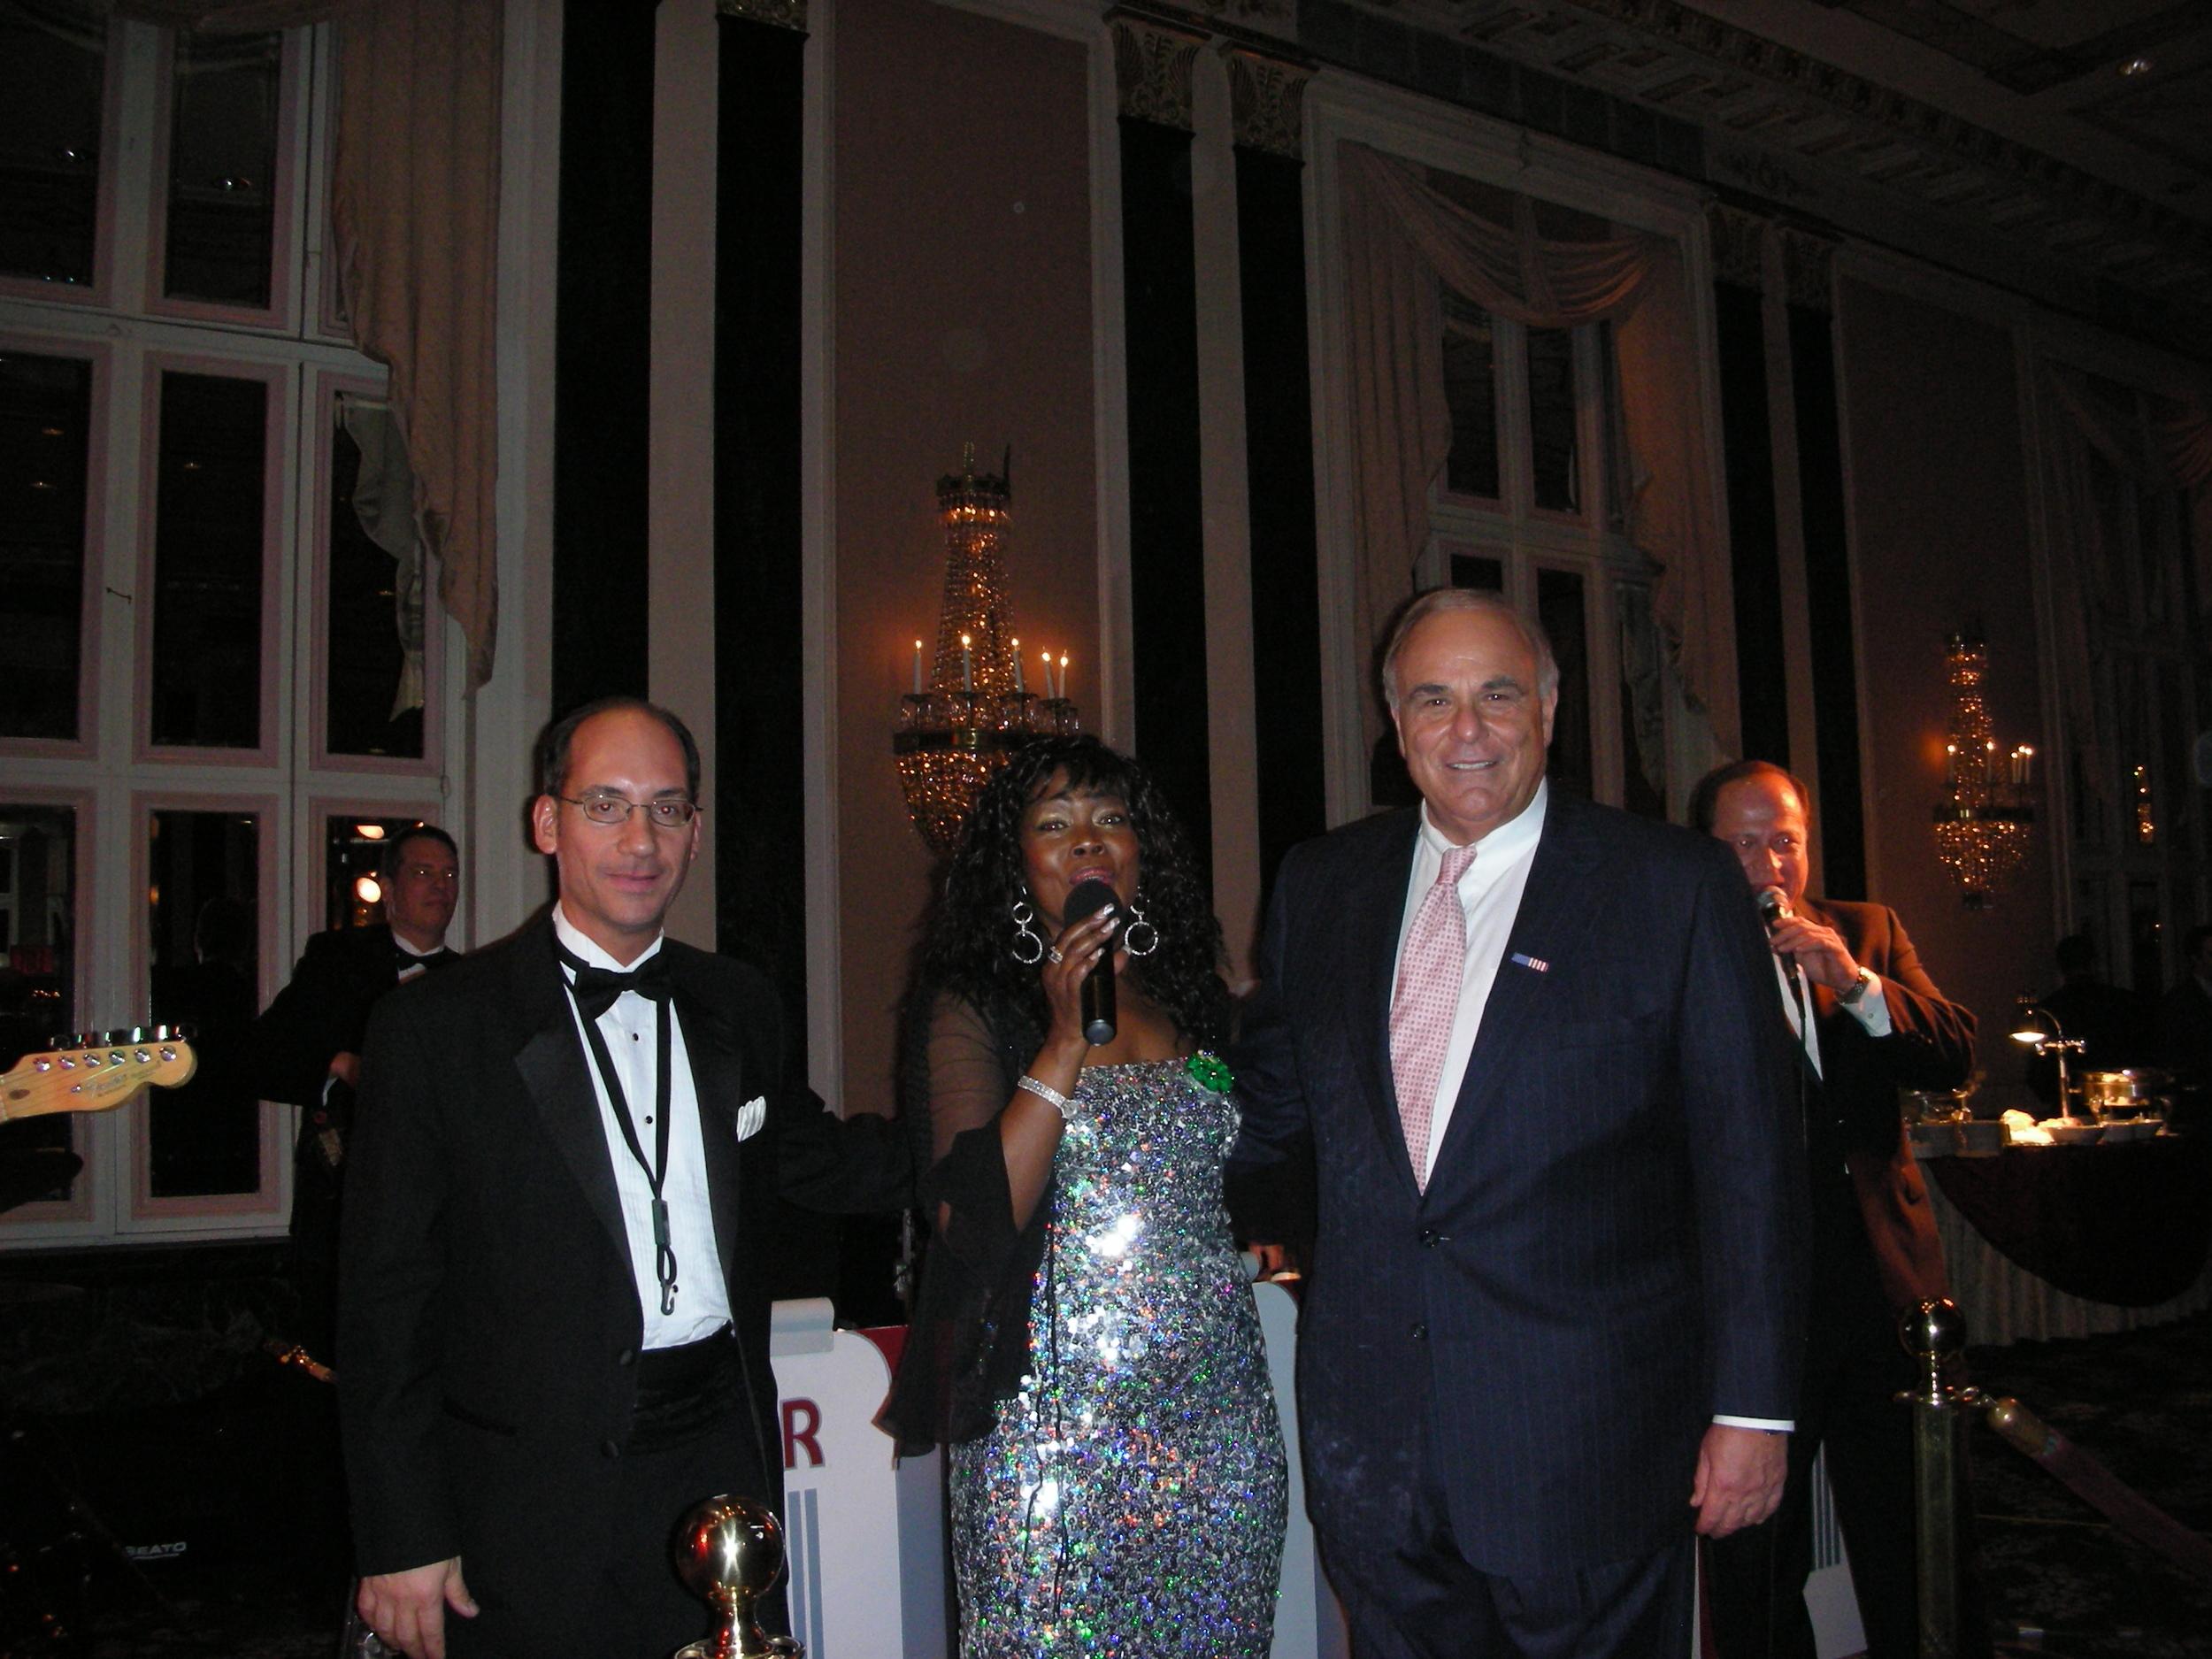 Gov. Rendell, Waldorf Astoria, New York